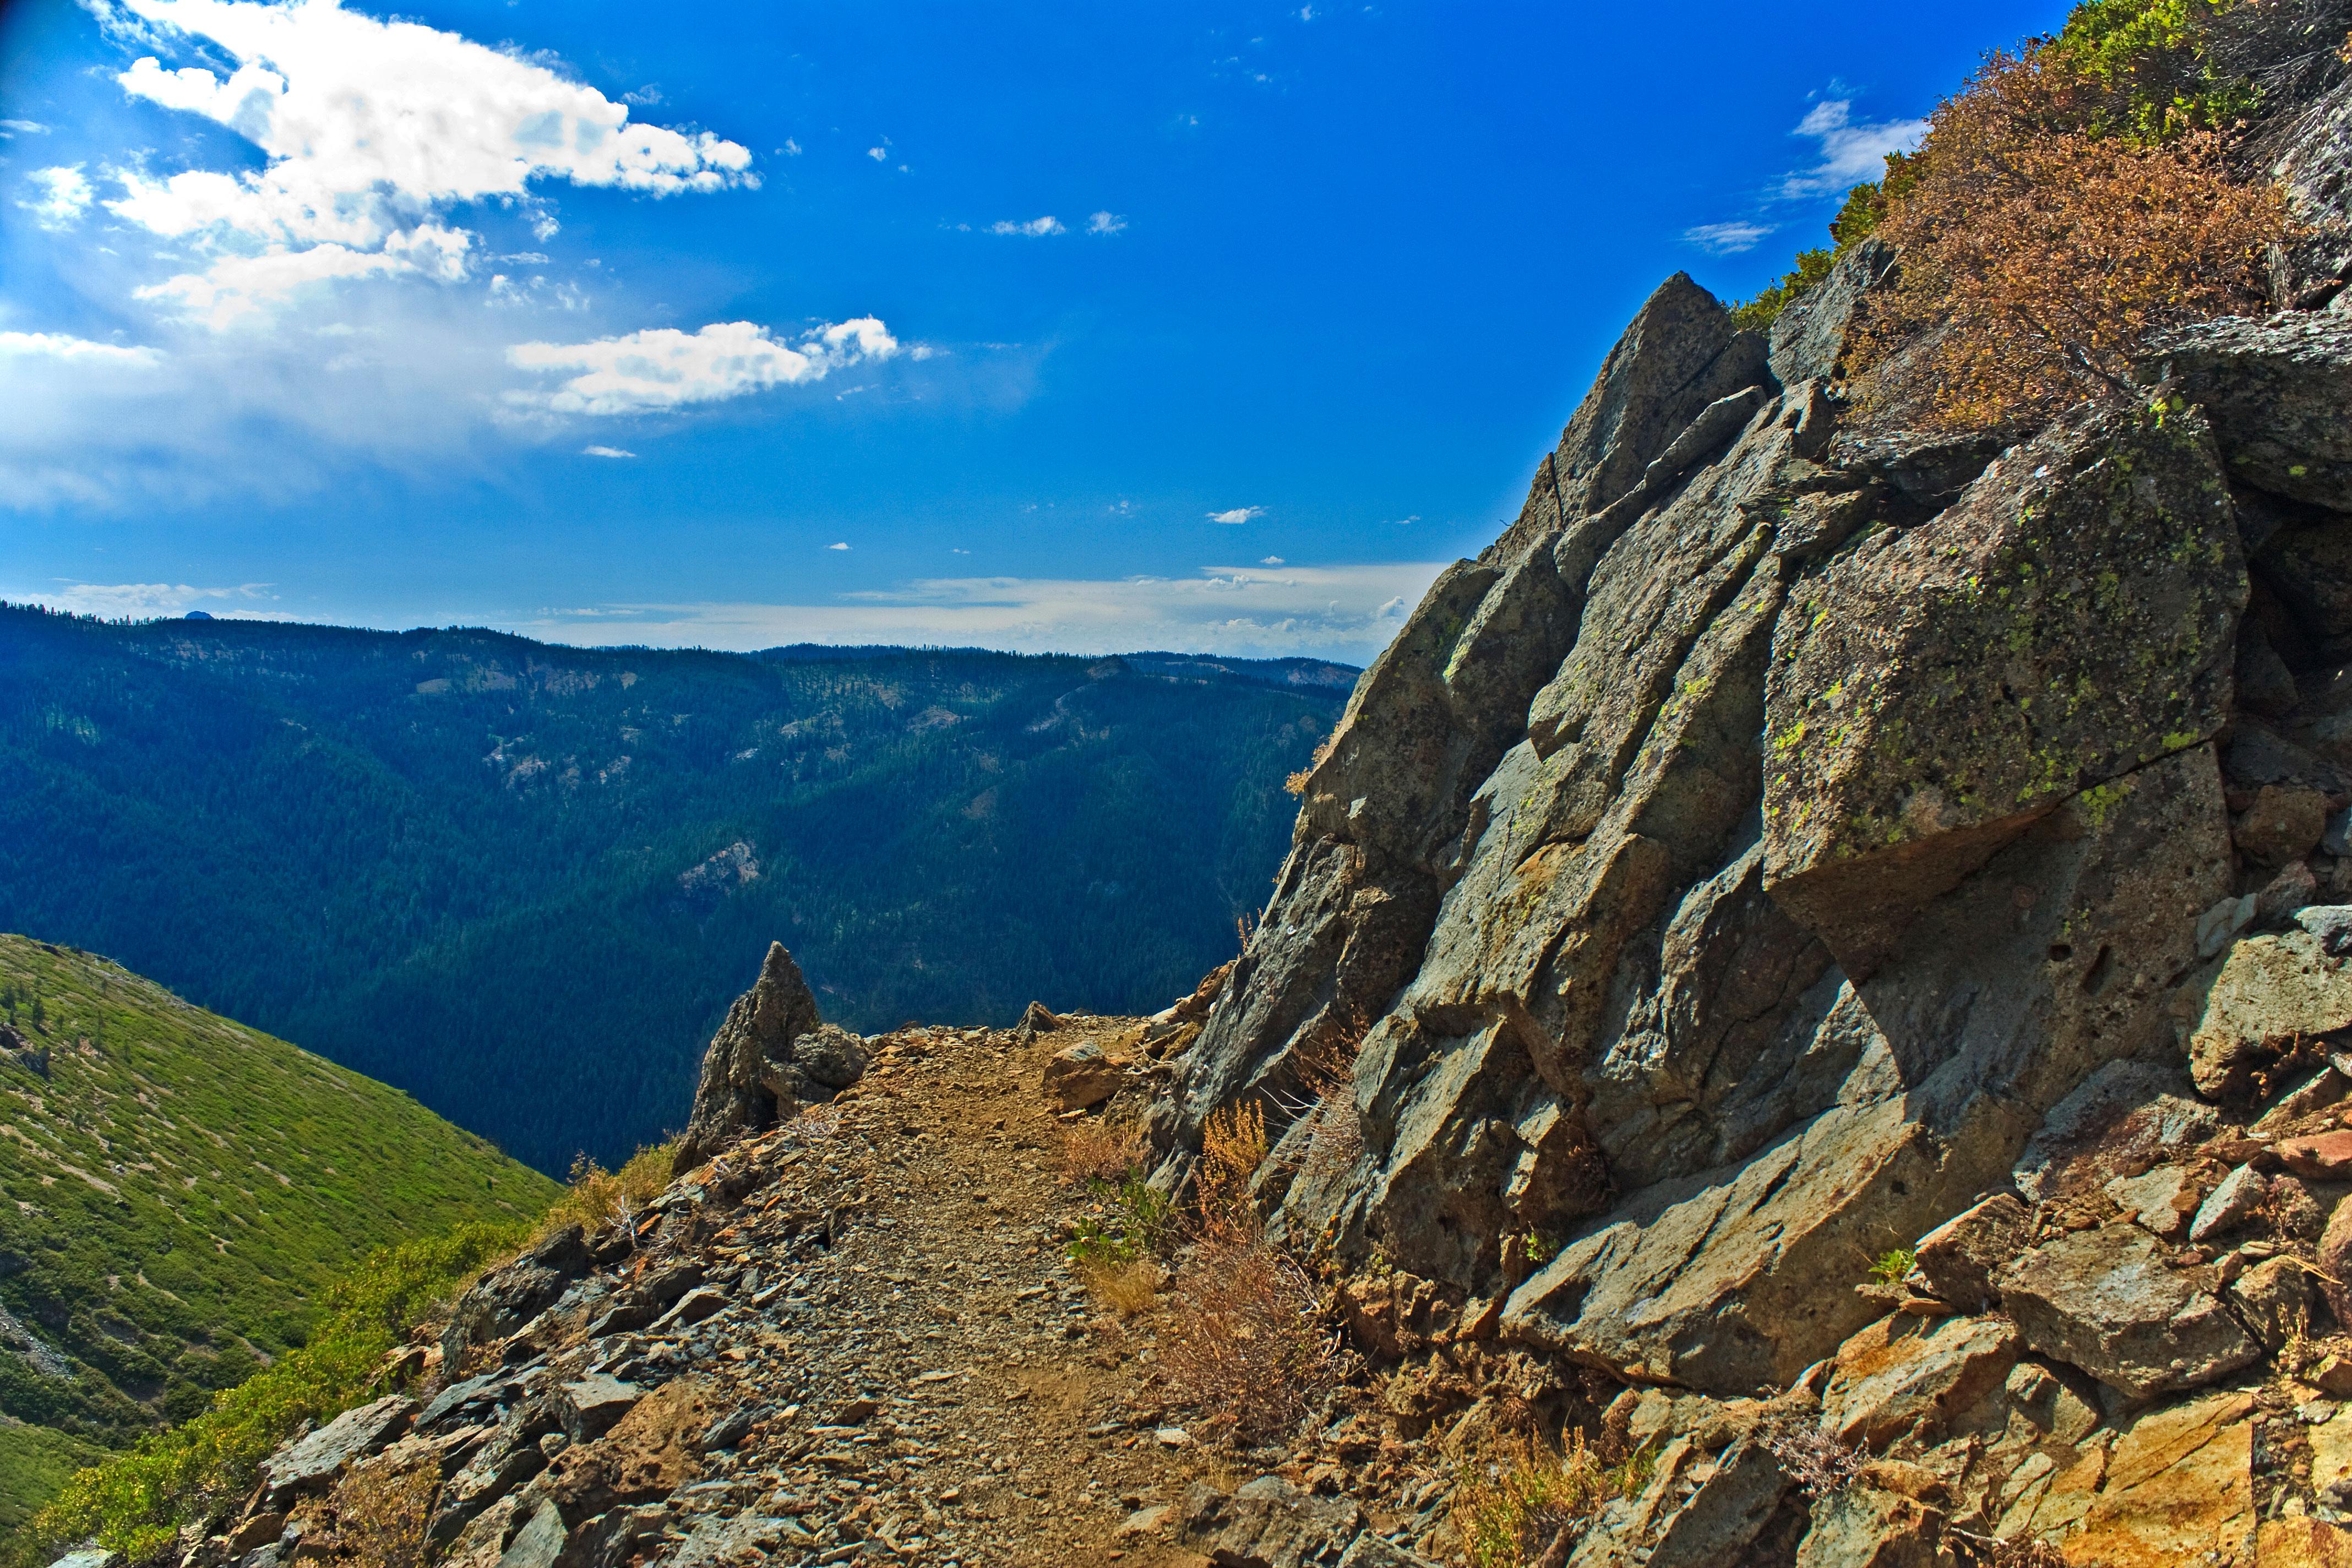 Sierra City California Wild Pacific Crest Trail Association